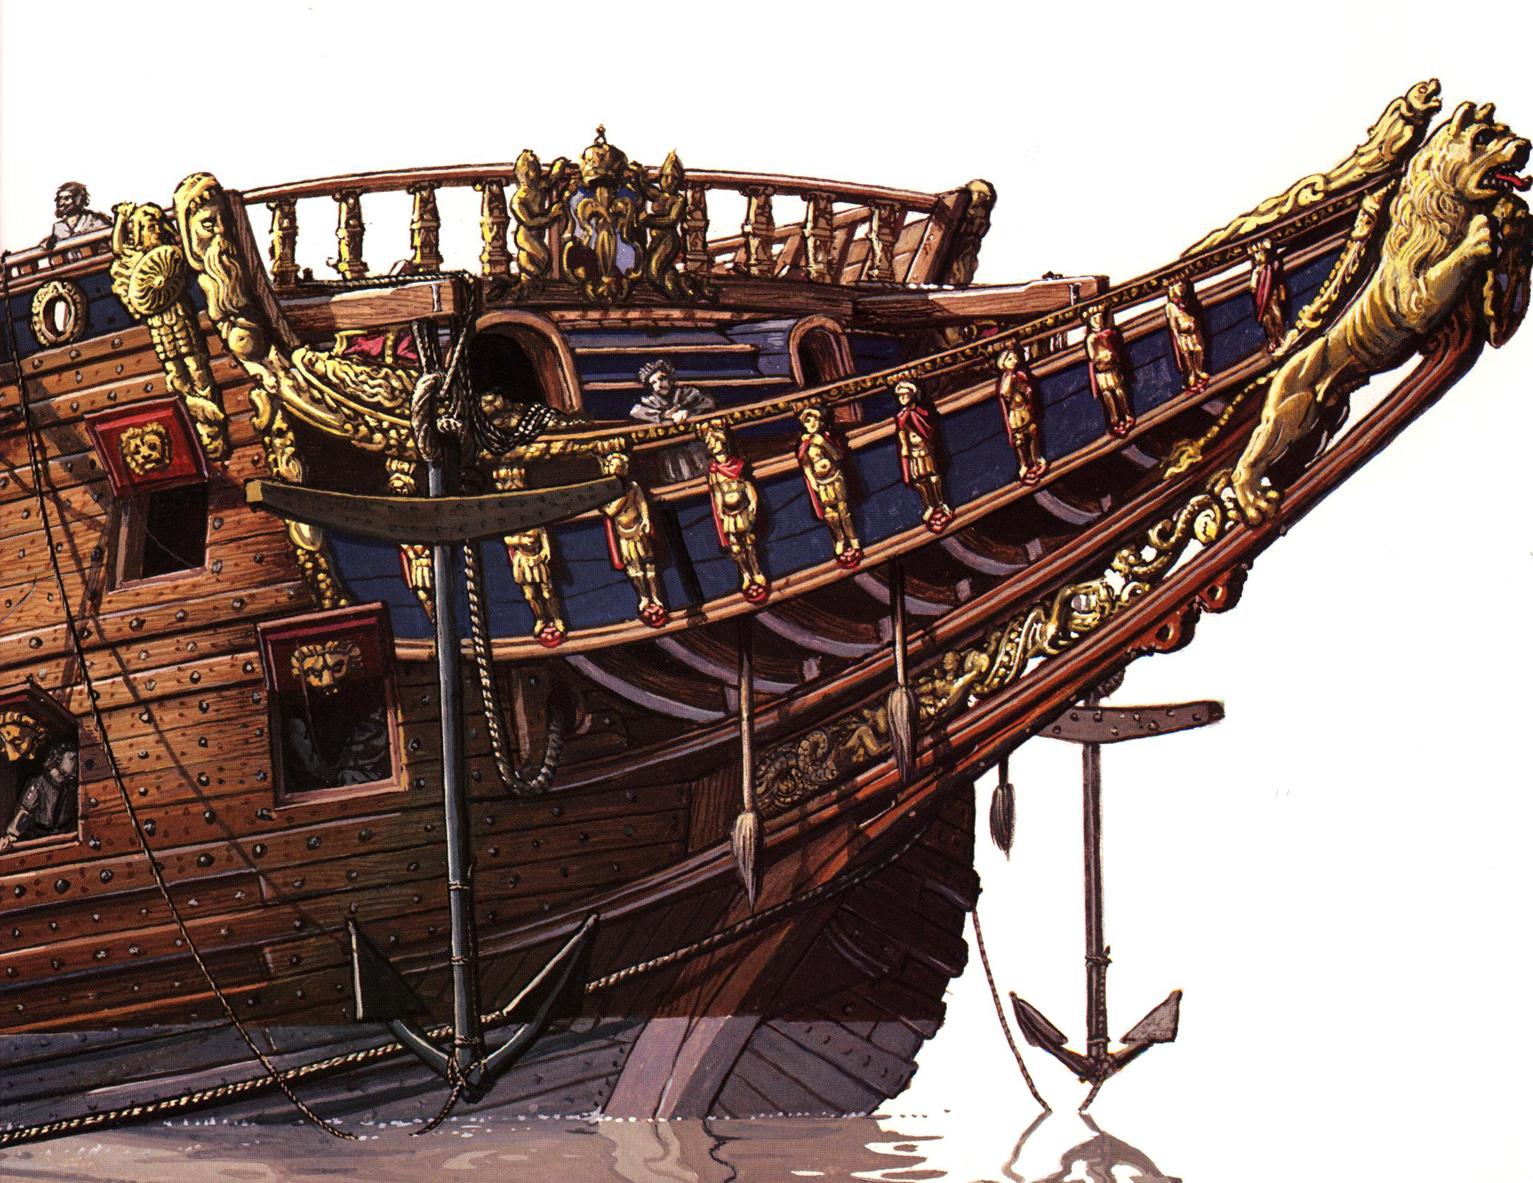 Надпись на корабле гальюн картинки